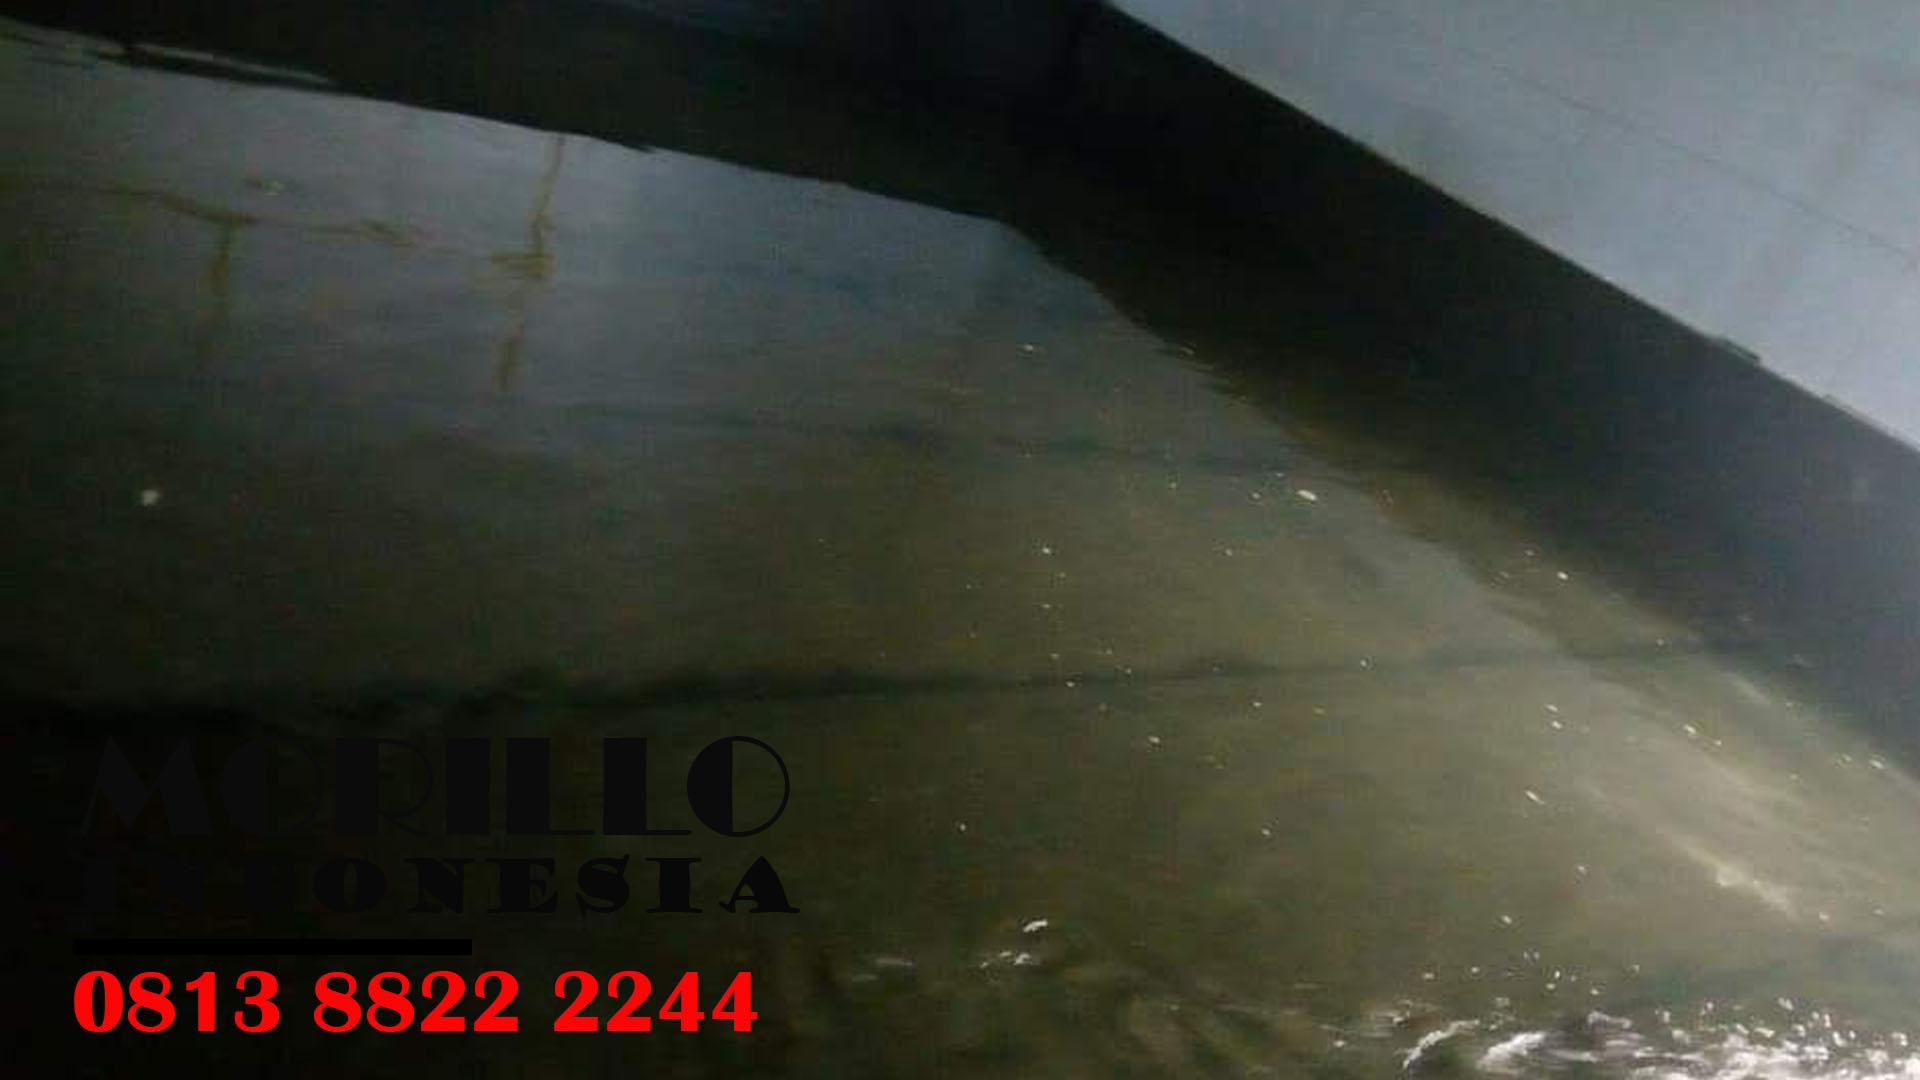 MEMBRAN BAKAR ANTI BOCOR di LENTENG AGUNG TELEPON KAMI : 081388222244